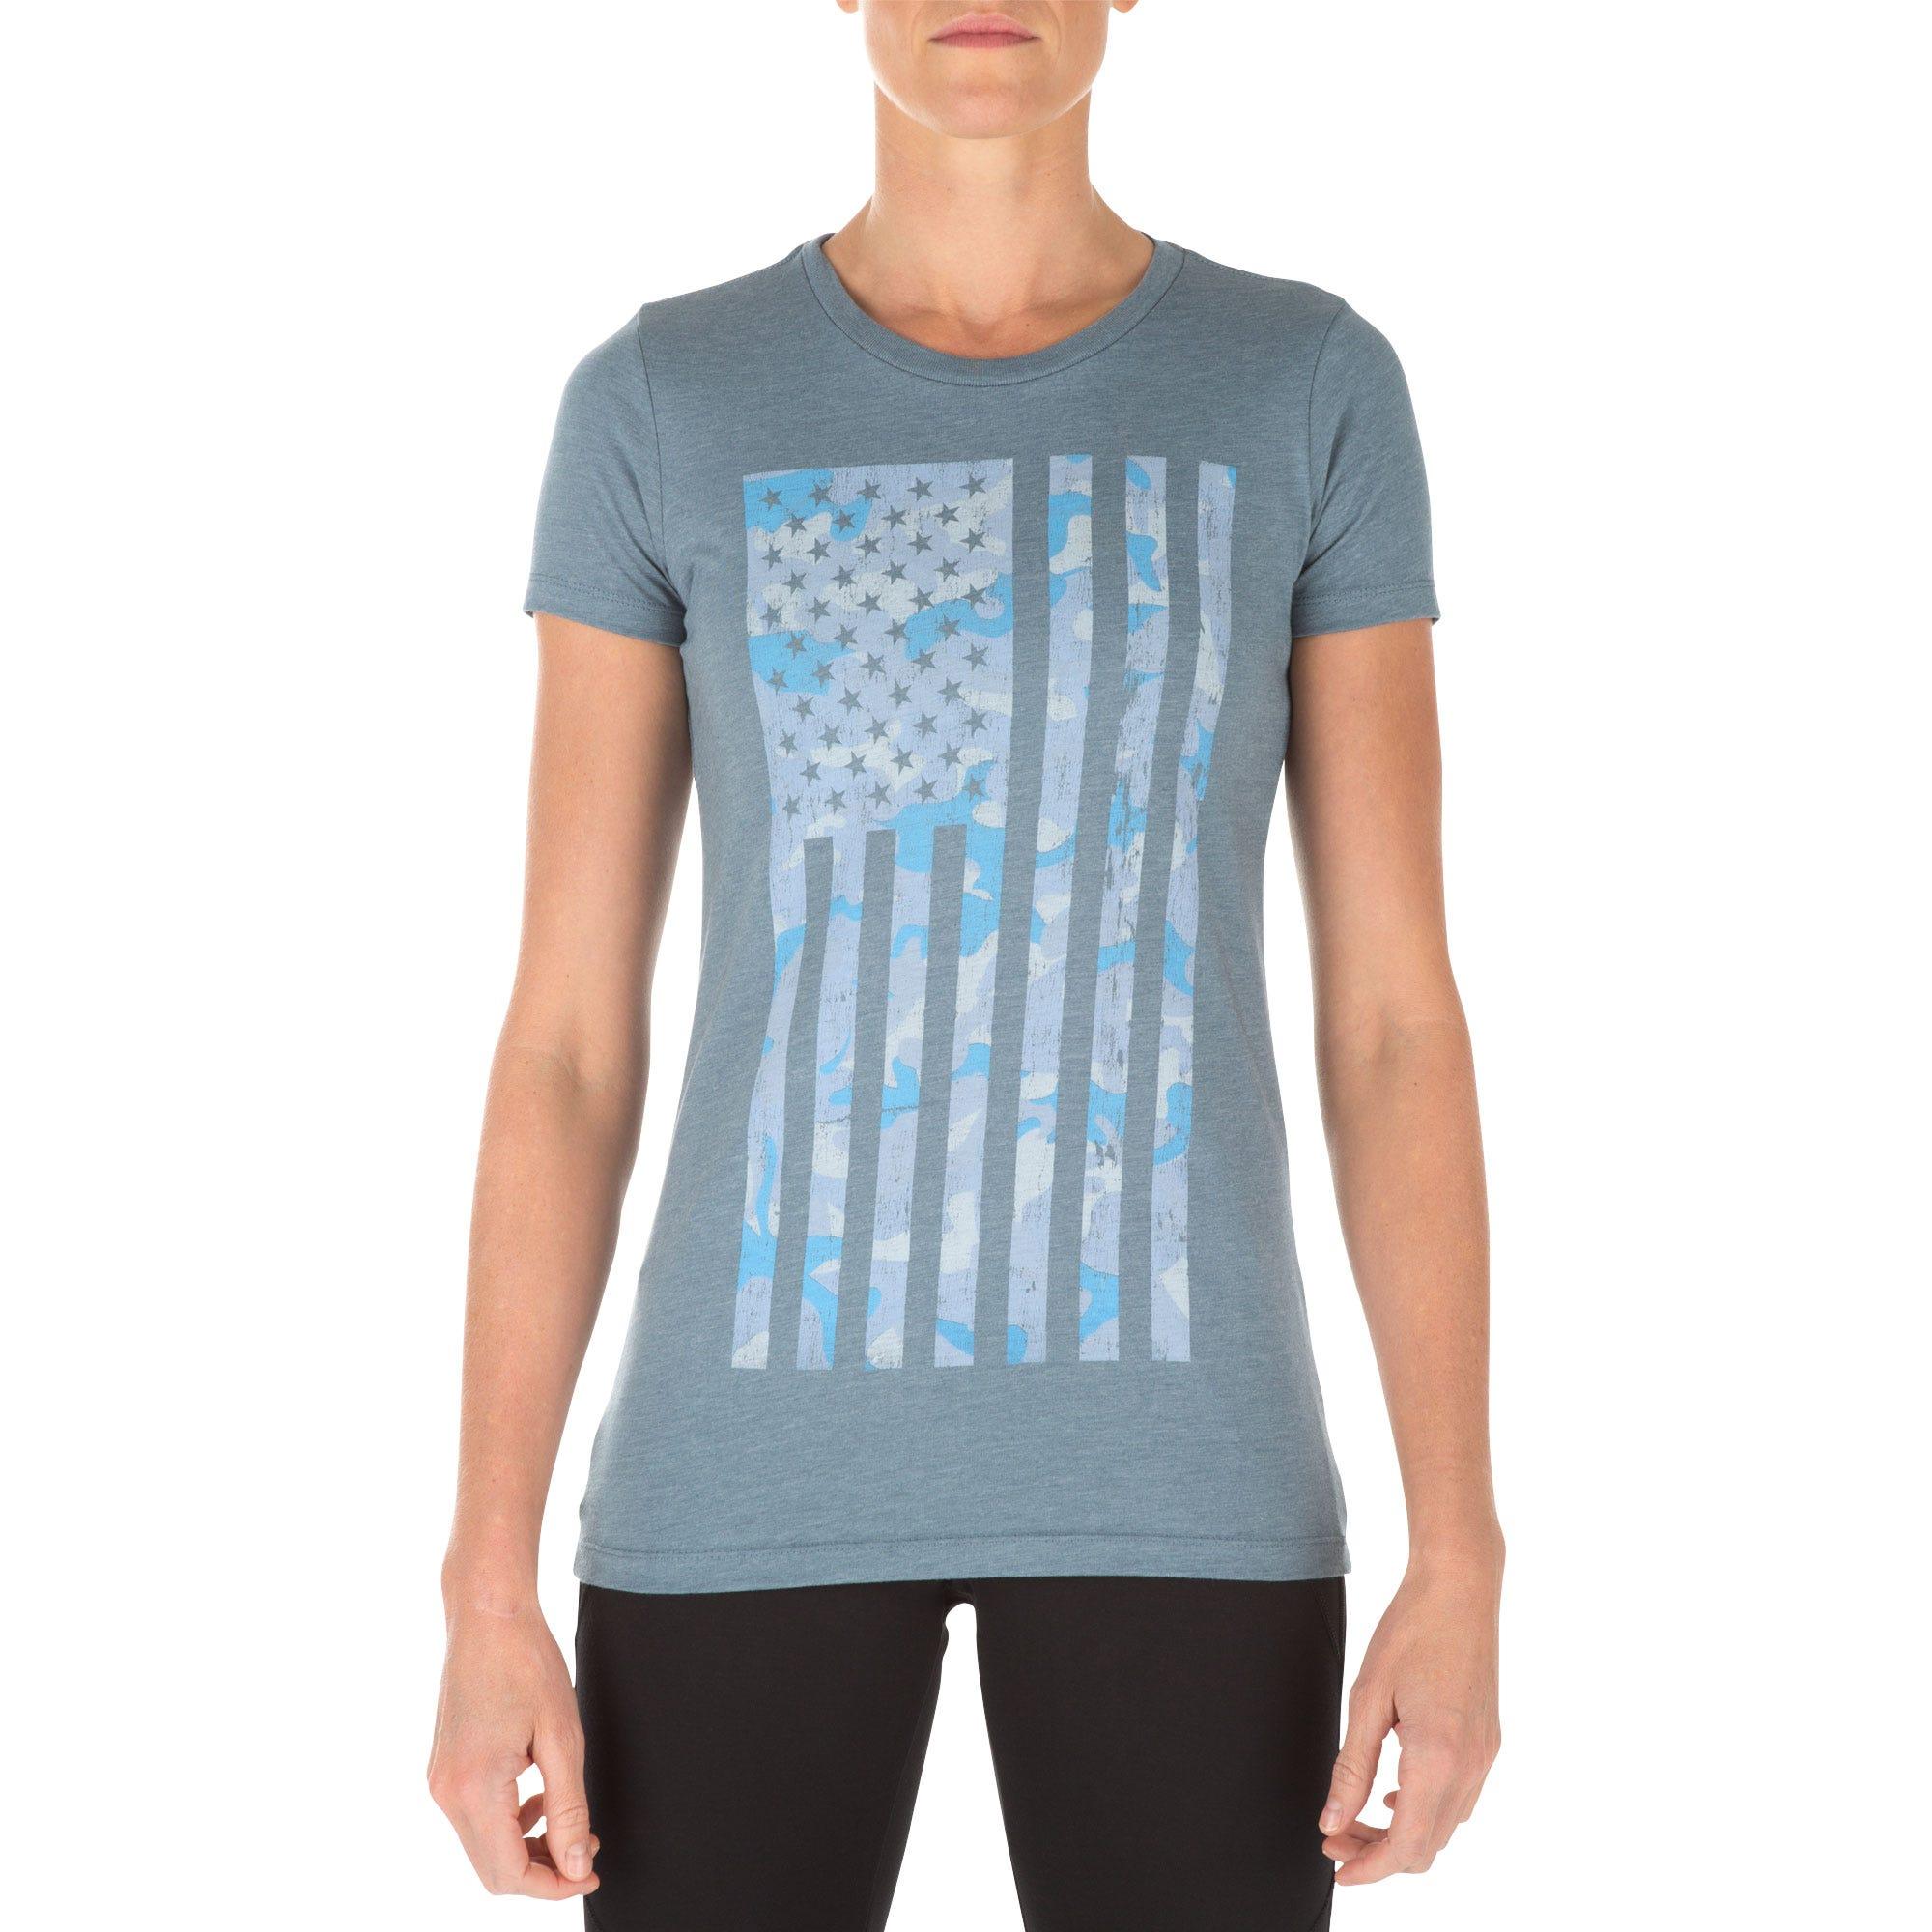 5.11 Tactical Women's Camo Flag Tee (Blue) thumbnail